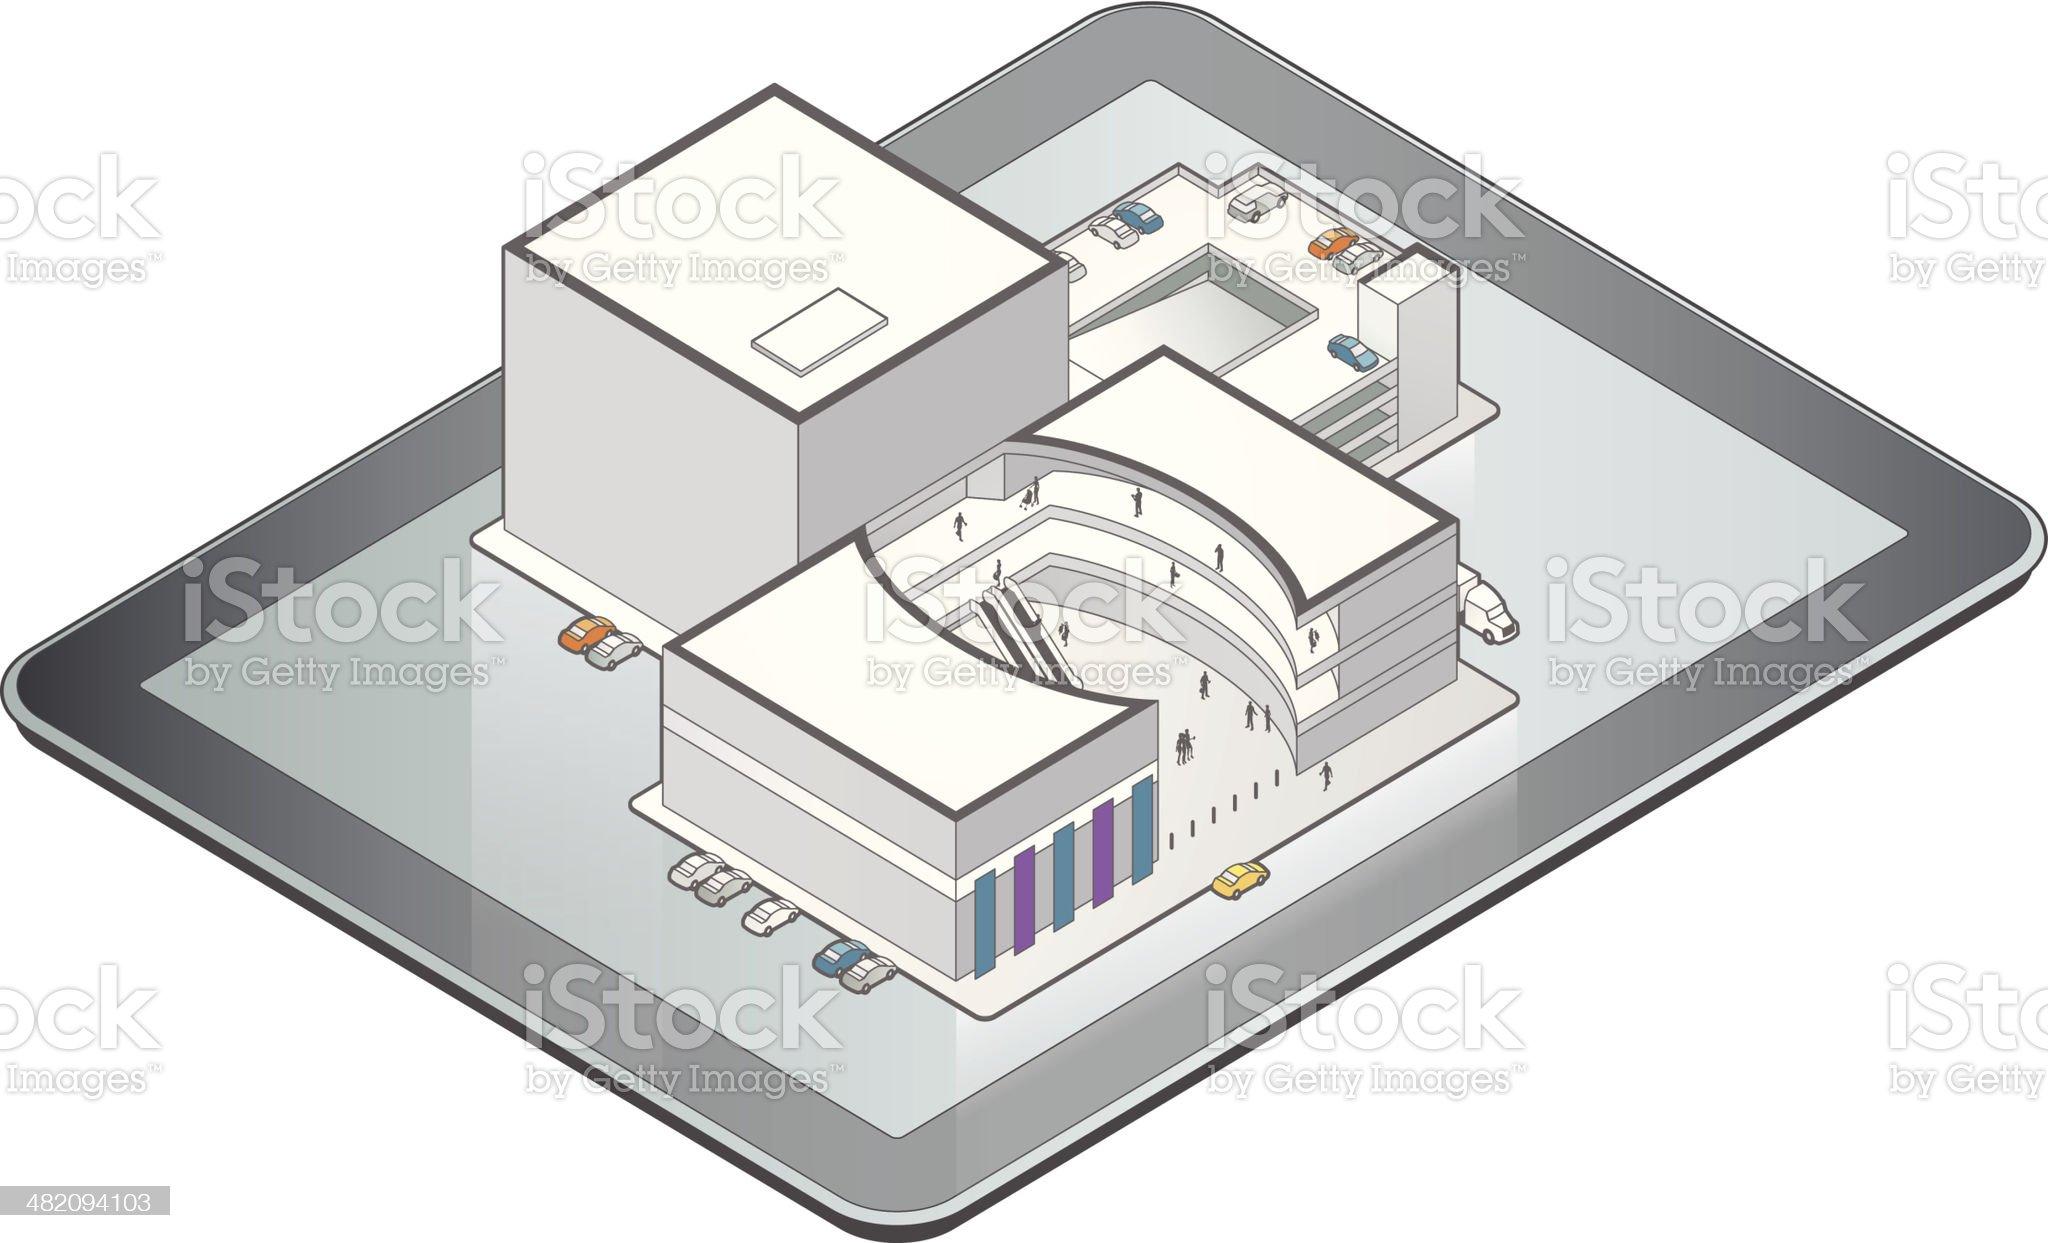 Online Shopping Mall Illustration royalty-free stock vector art